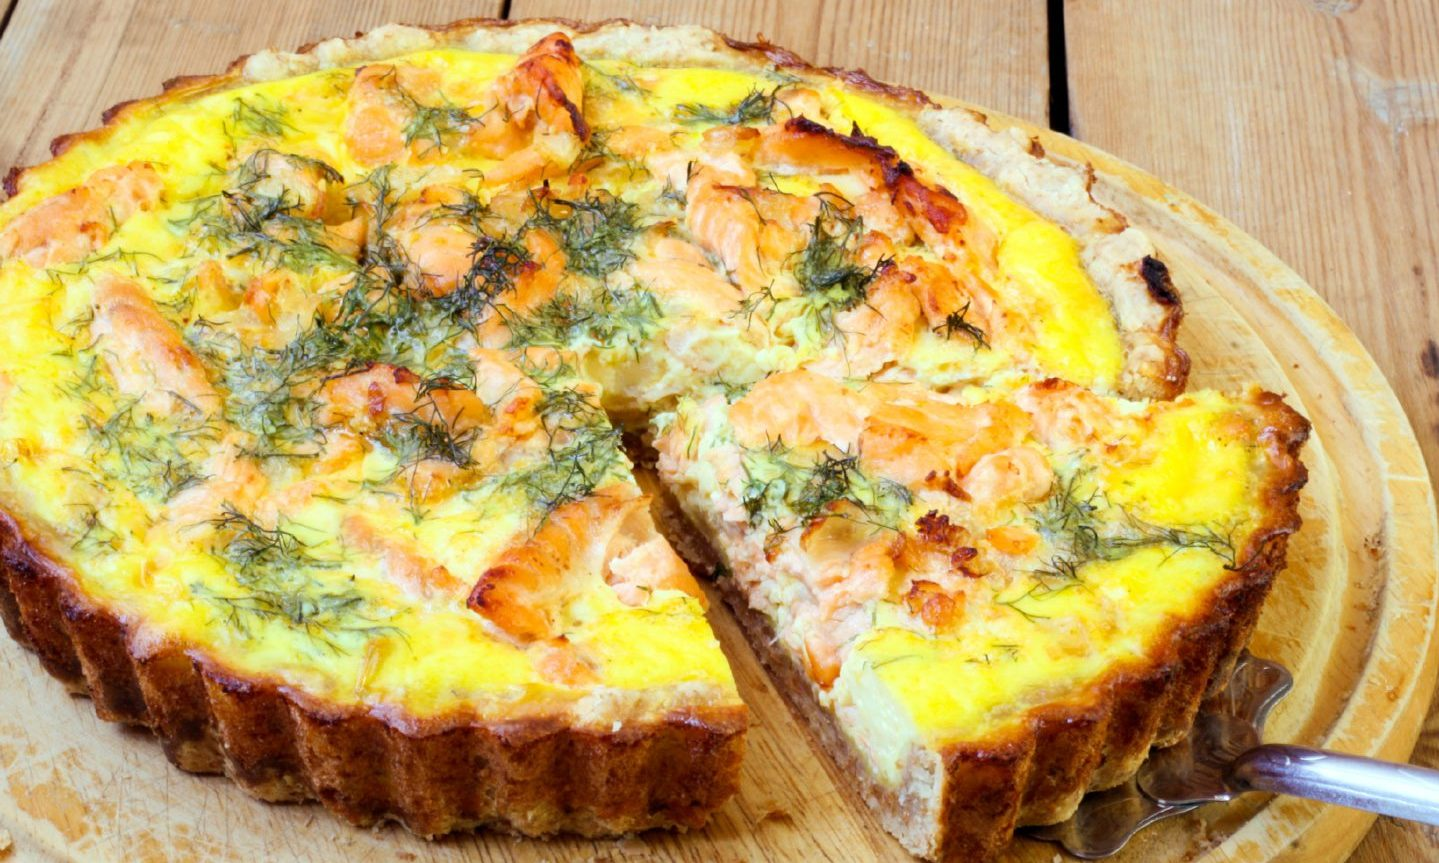 Salmon and dill tart.